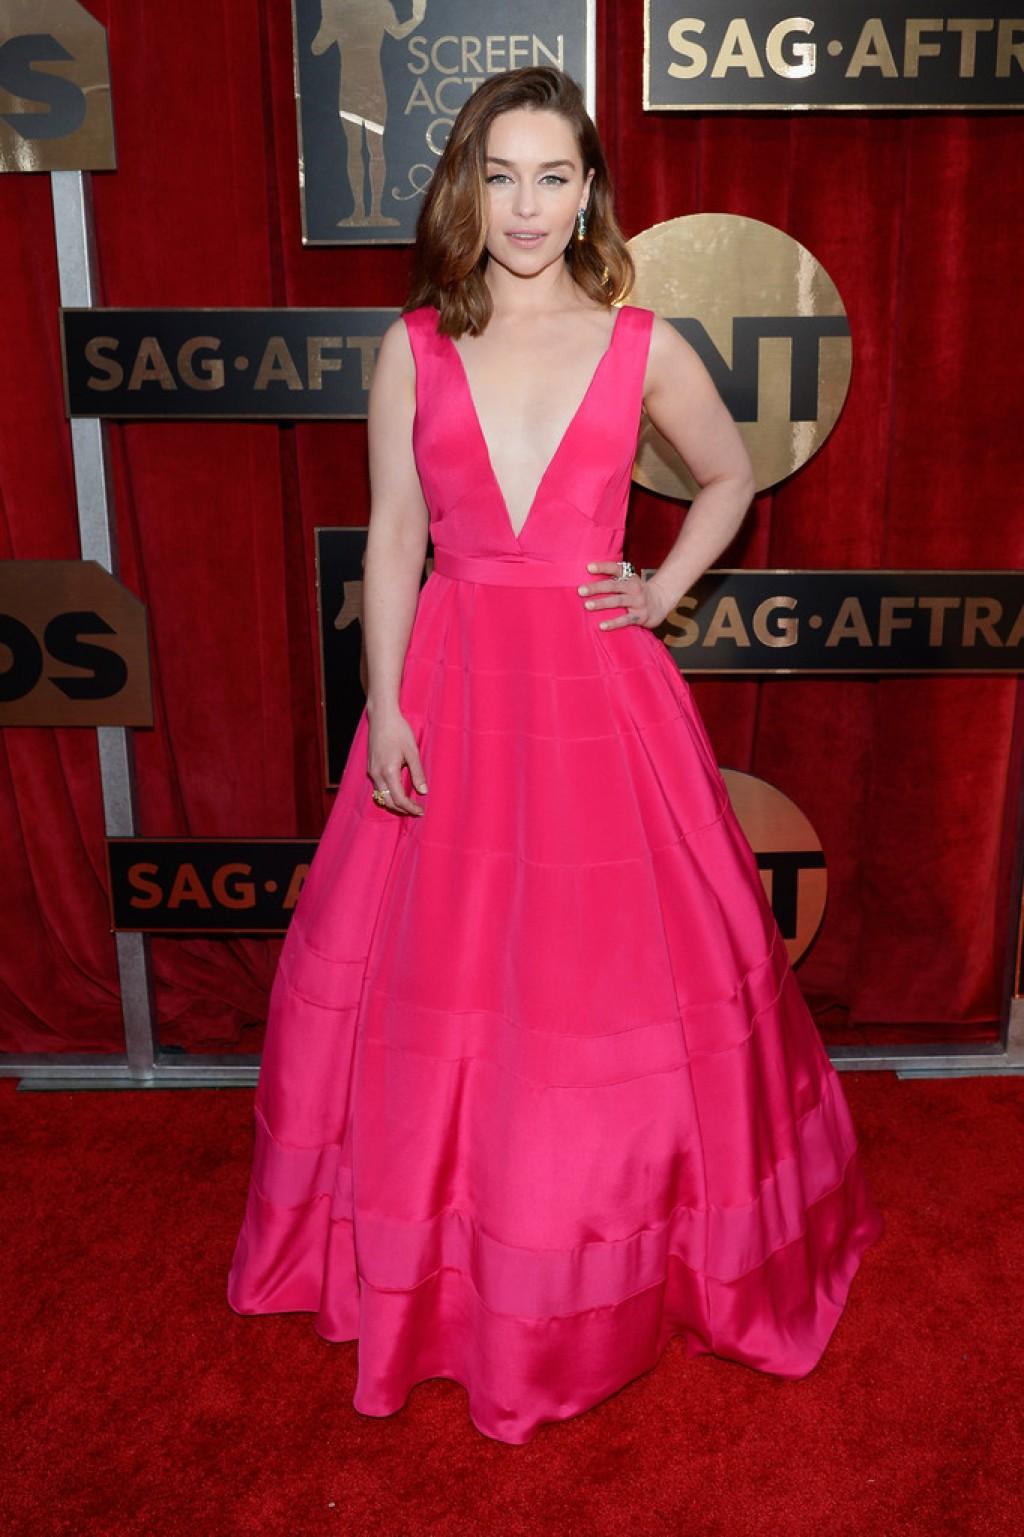 emilia-clarke-2016-sag-dior-haute-couture-gown-style-1024x1537